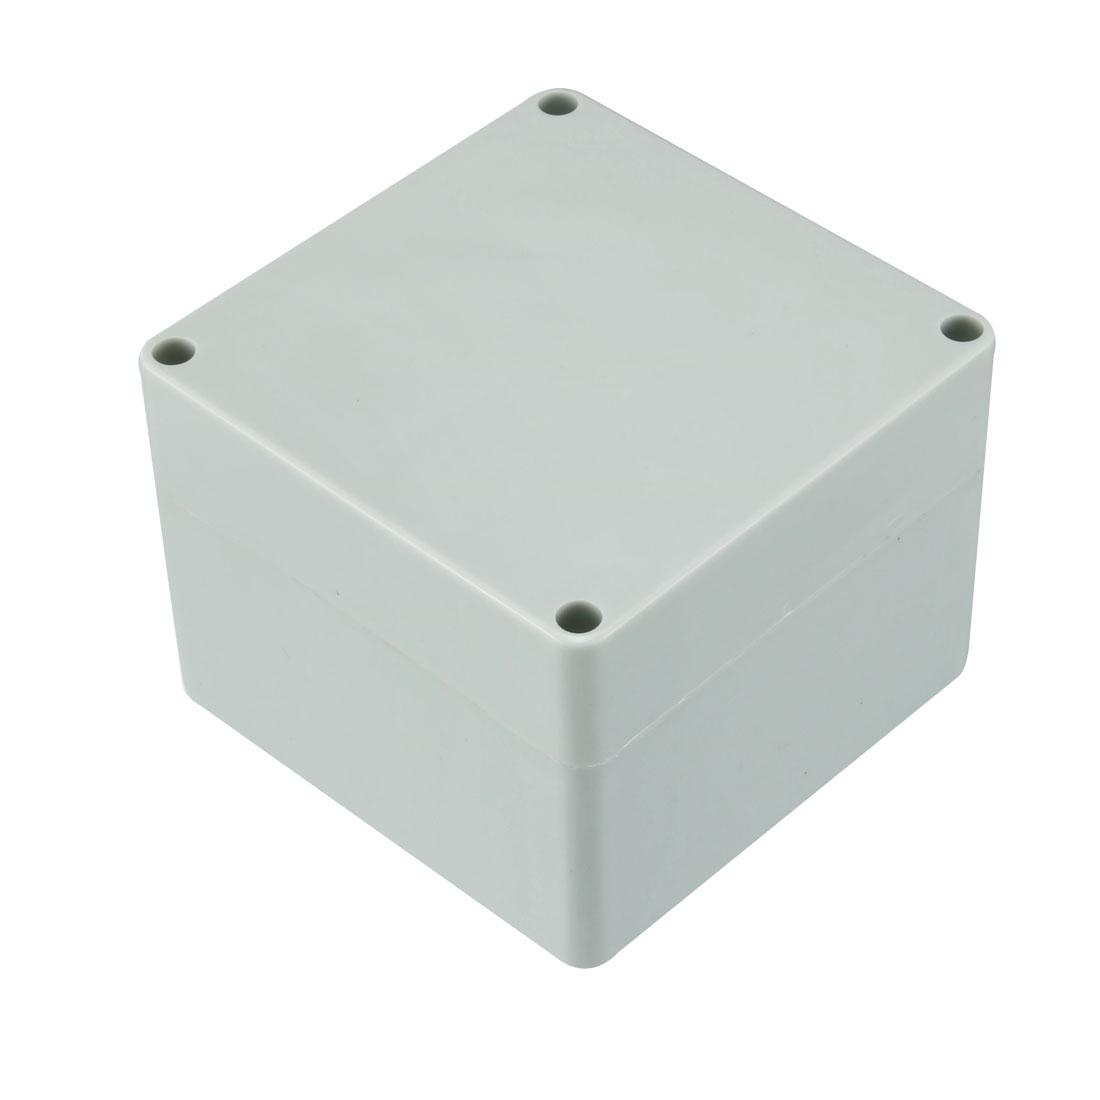 120 x 120 x 90mm Electronic Plastic DIY Junction Box Enclosure Case Gray